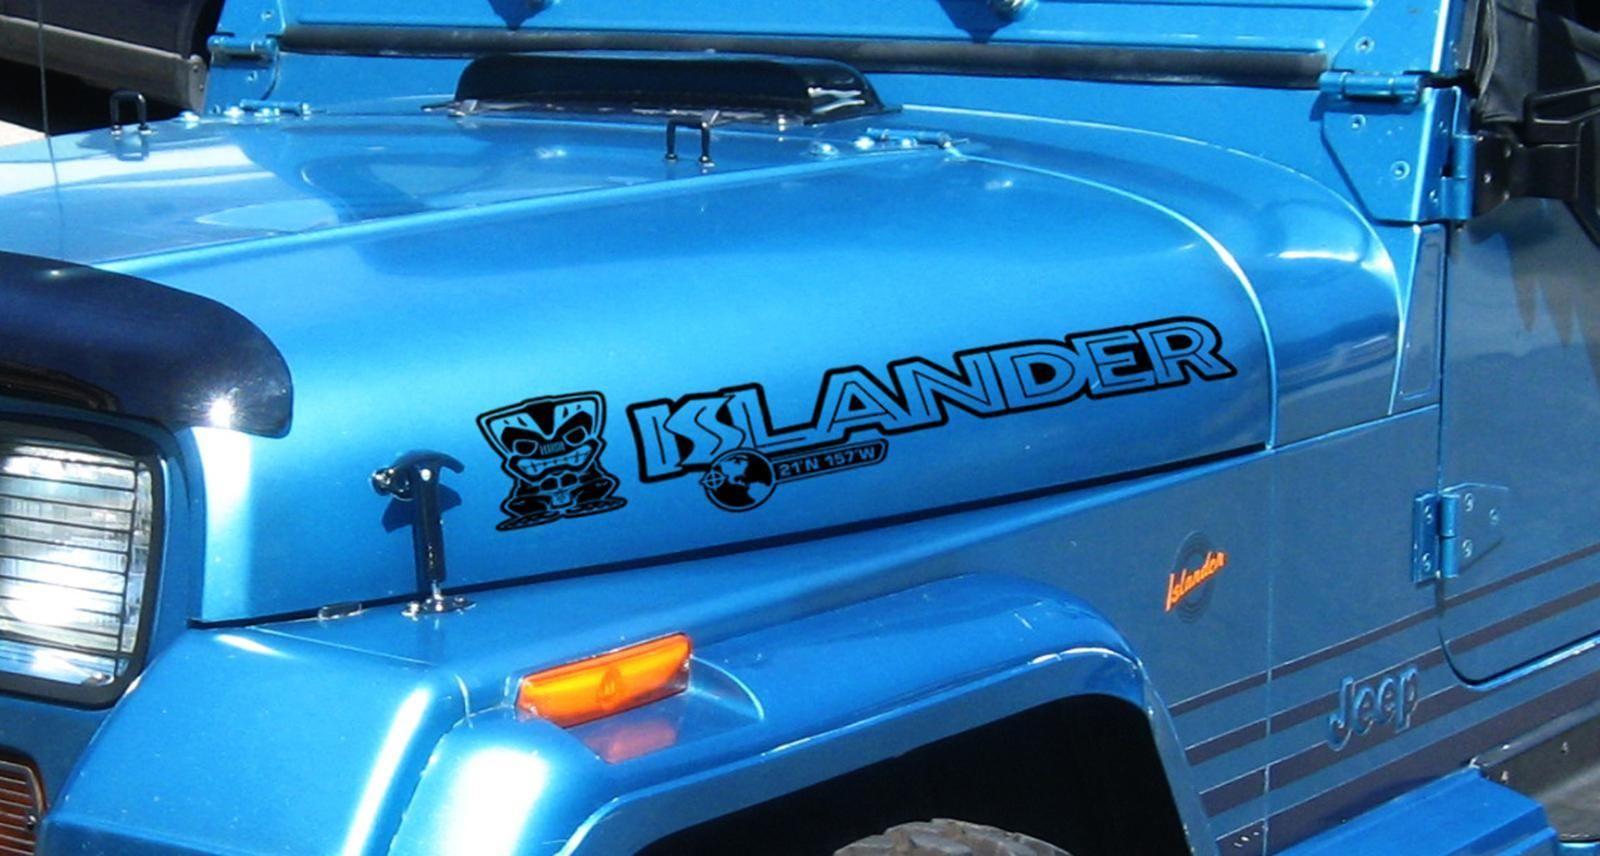 Jeep islander decal